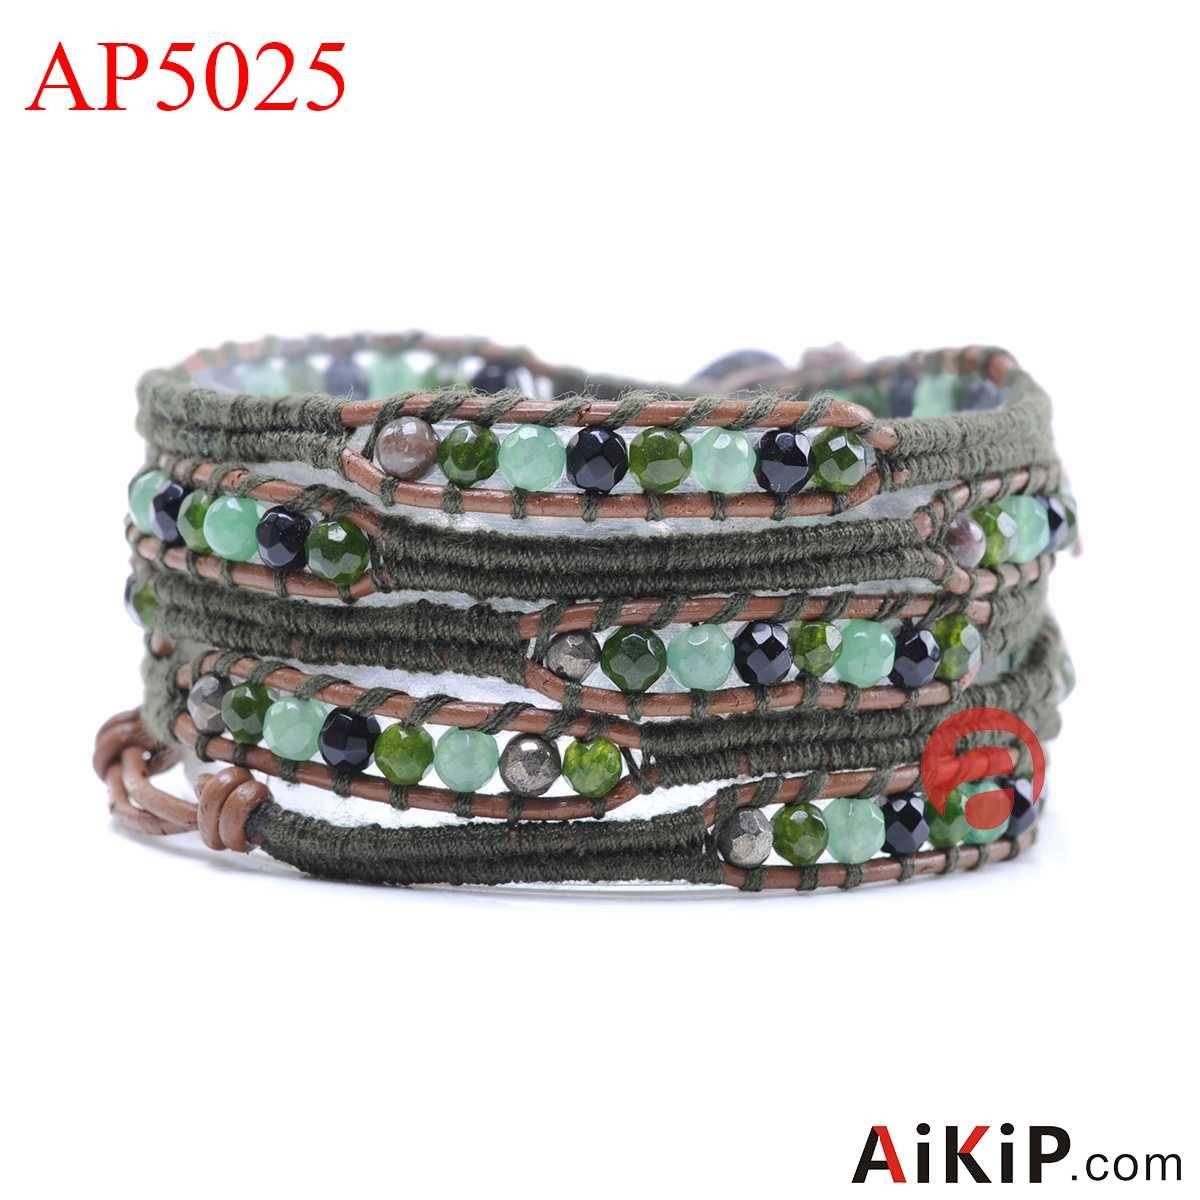 Green Aventurine black agate malay jade wool leather stainless steel clasp bracelet